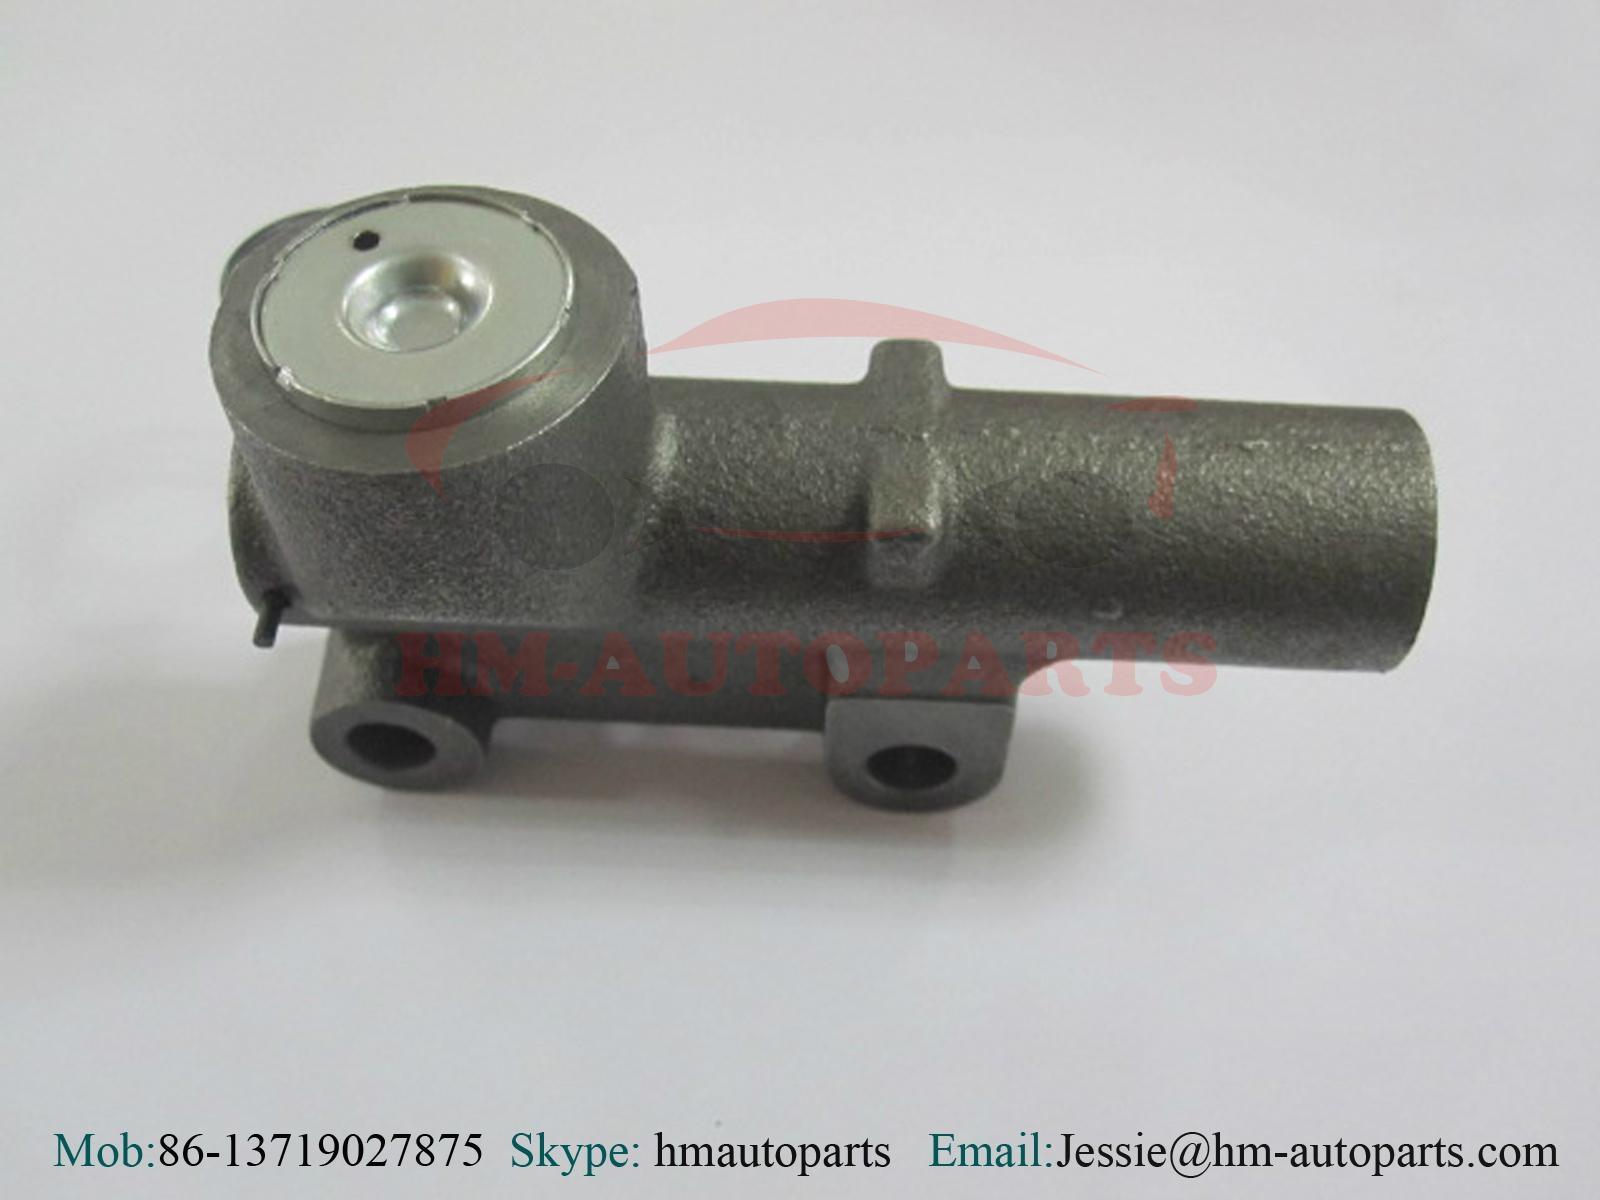 Timing Belt Auto Tensioner for 02-05 Sedona 3.5L 24410-39001 4